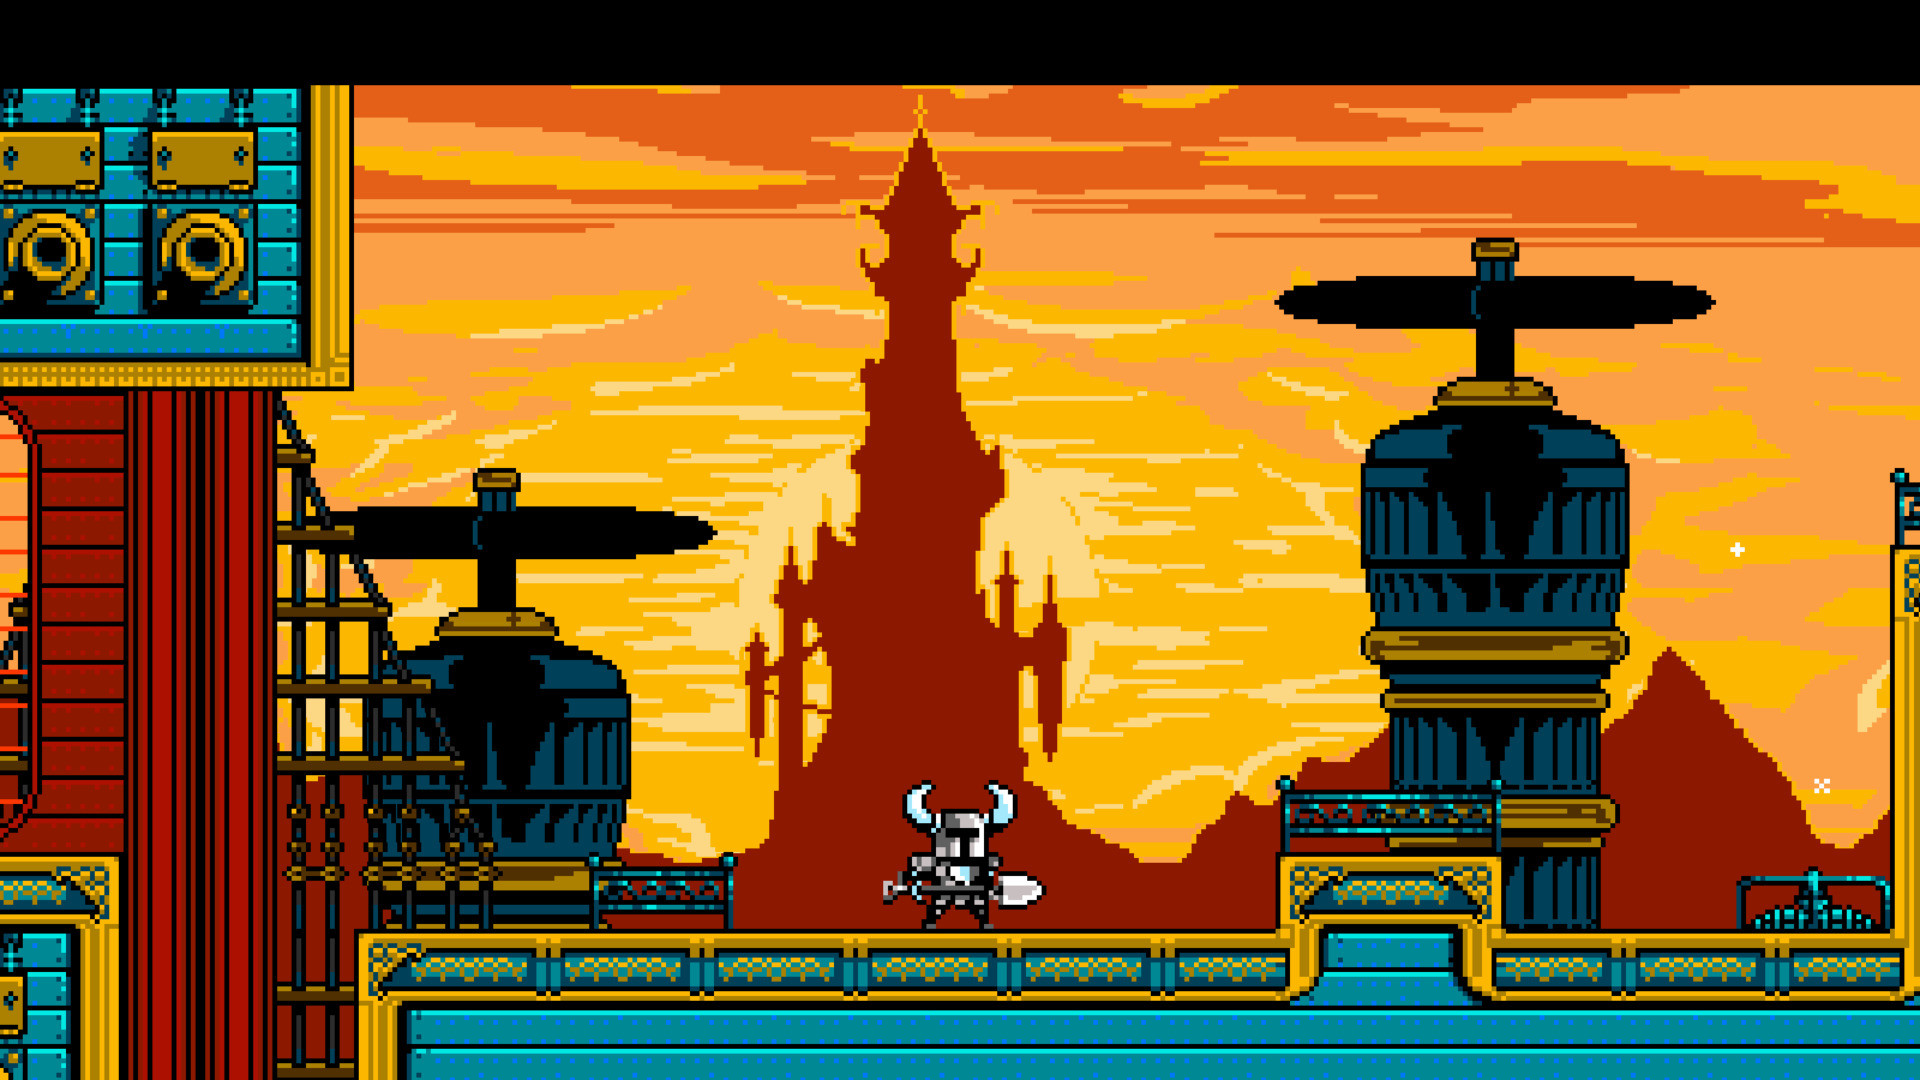 Shovel Knight, Video Games, Pixel Art, Retro Games, 8 bit, 16 bit Wallpapers  HD / Desktop and Mobile Backgrounds